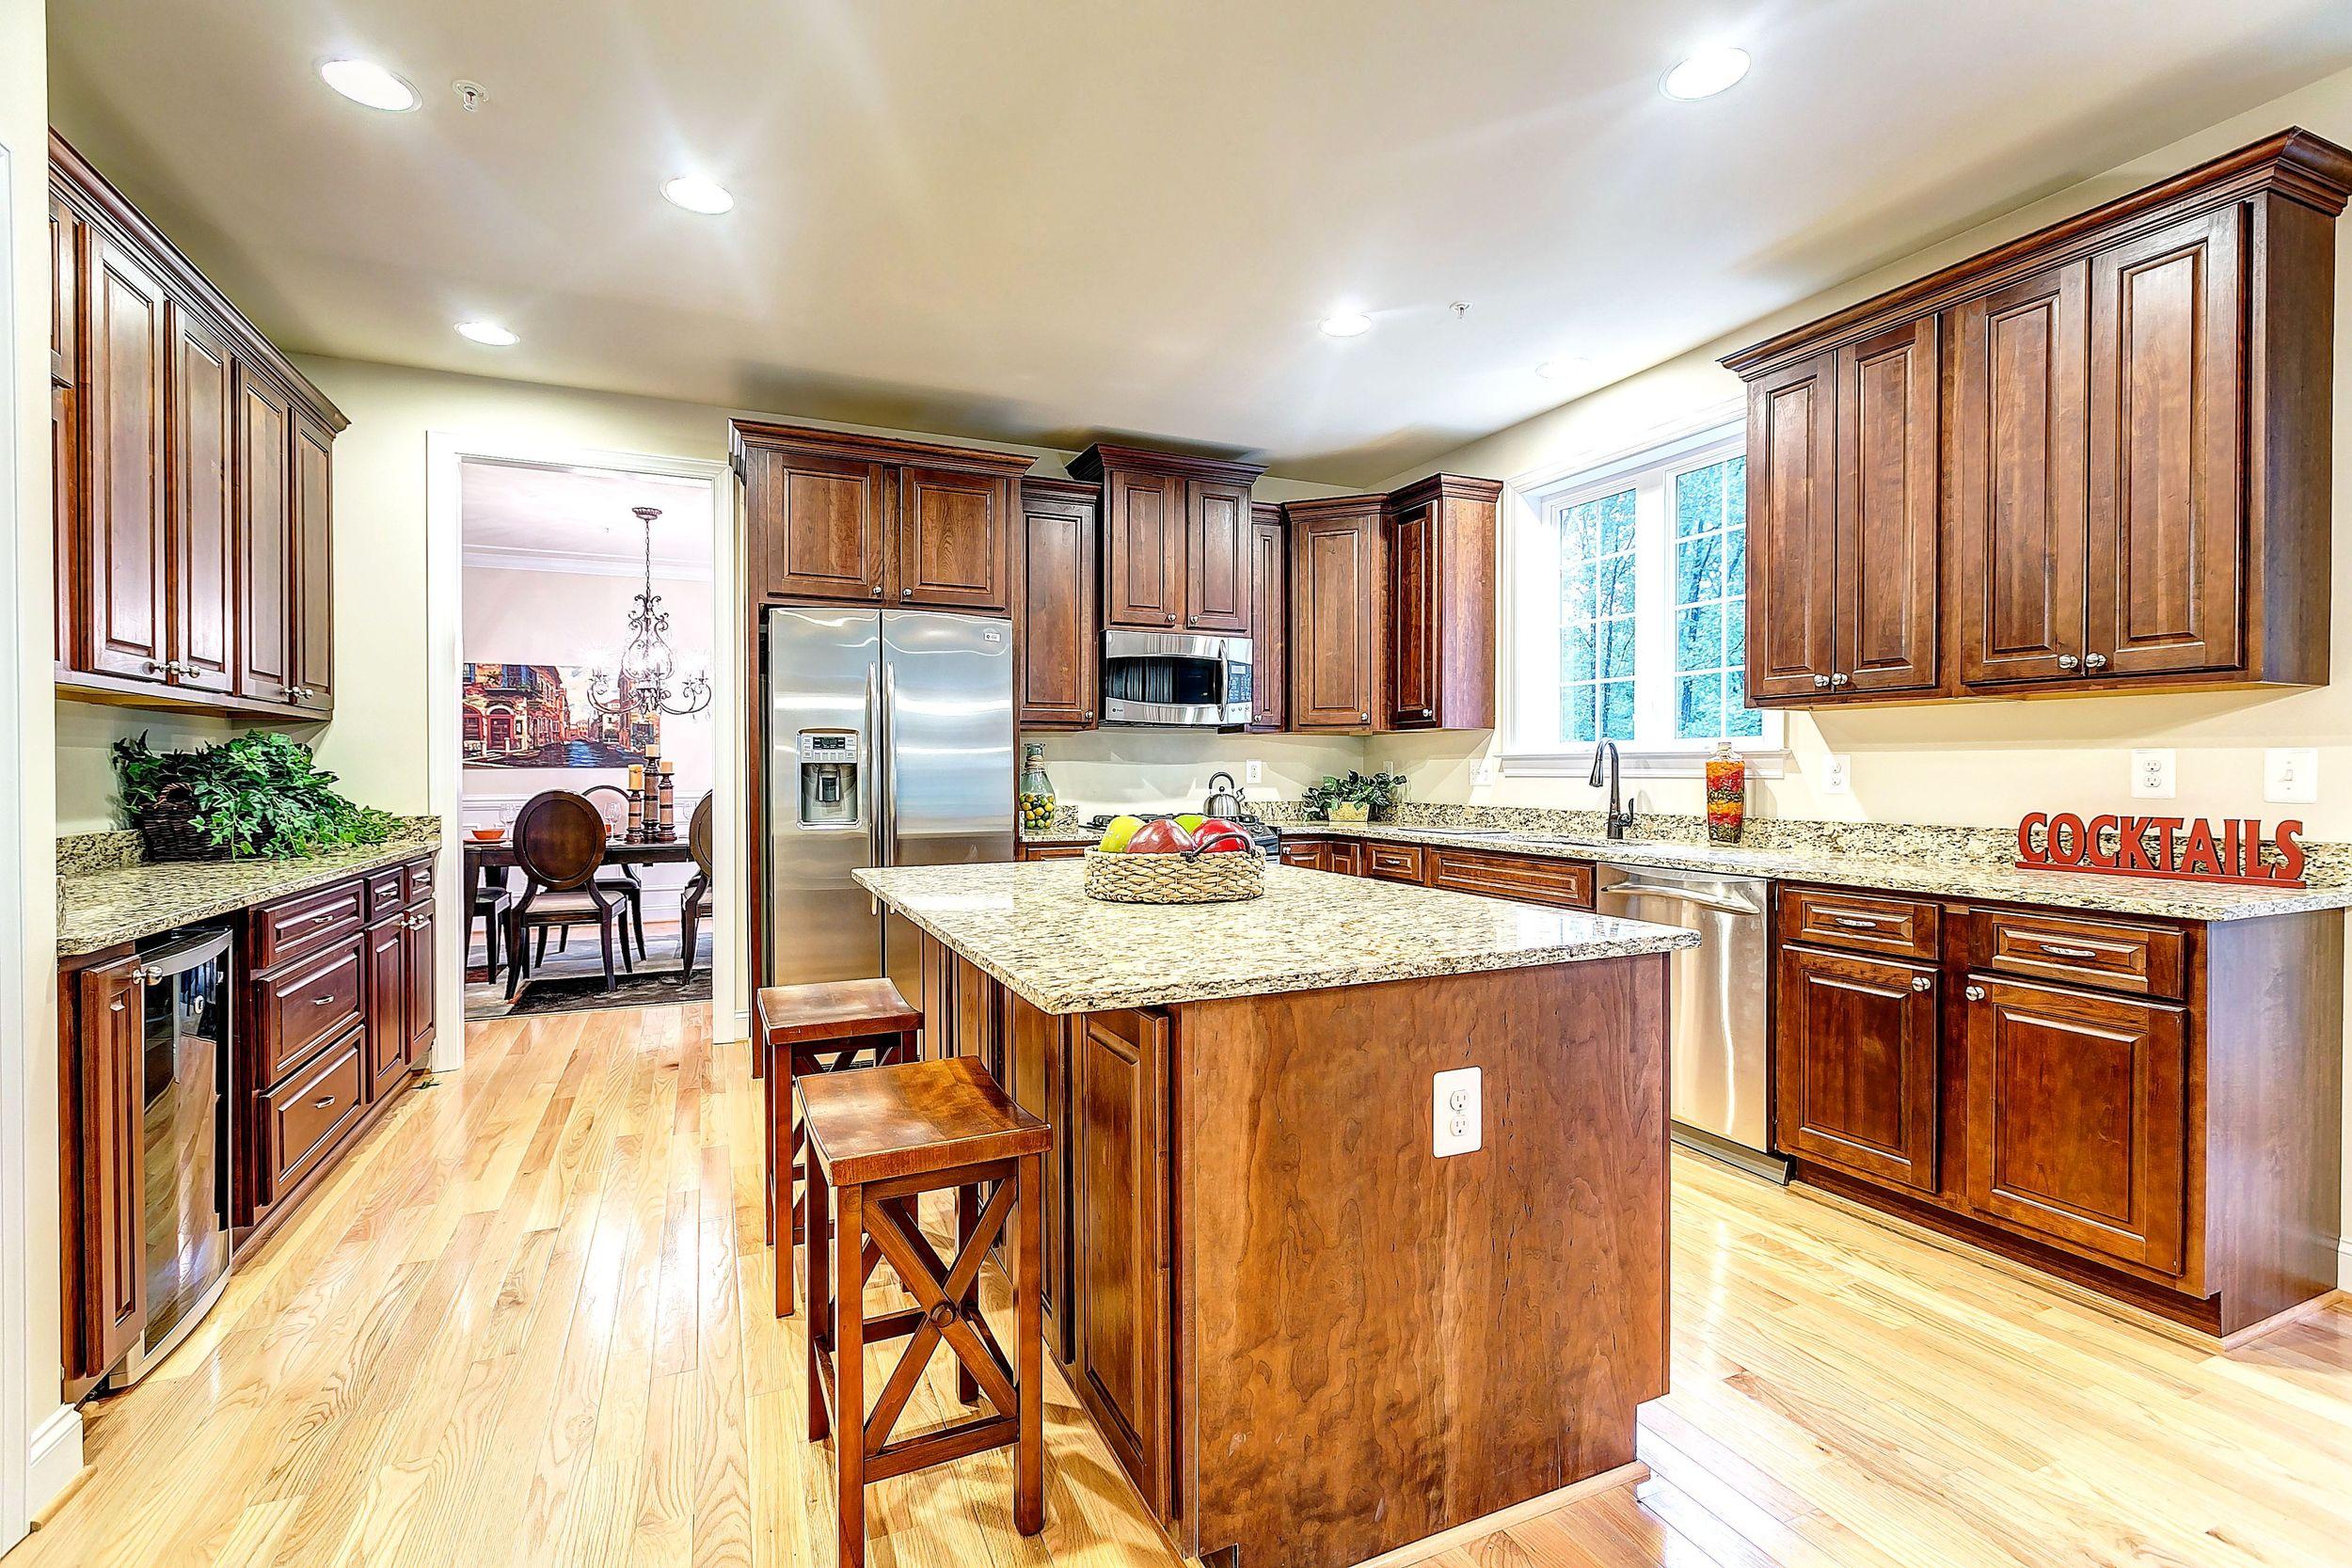 rylea-homes-custom-home-14.jpg